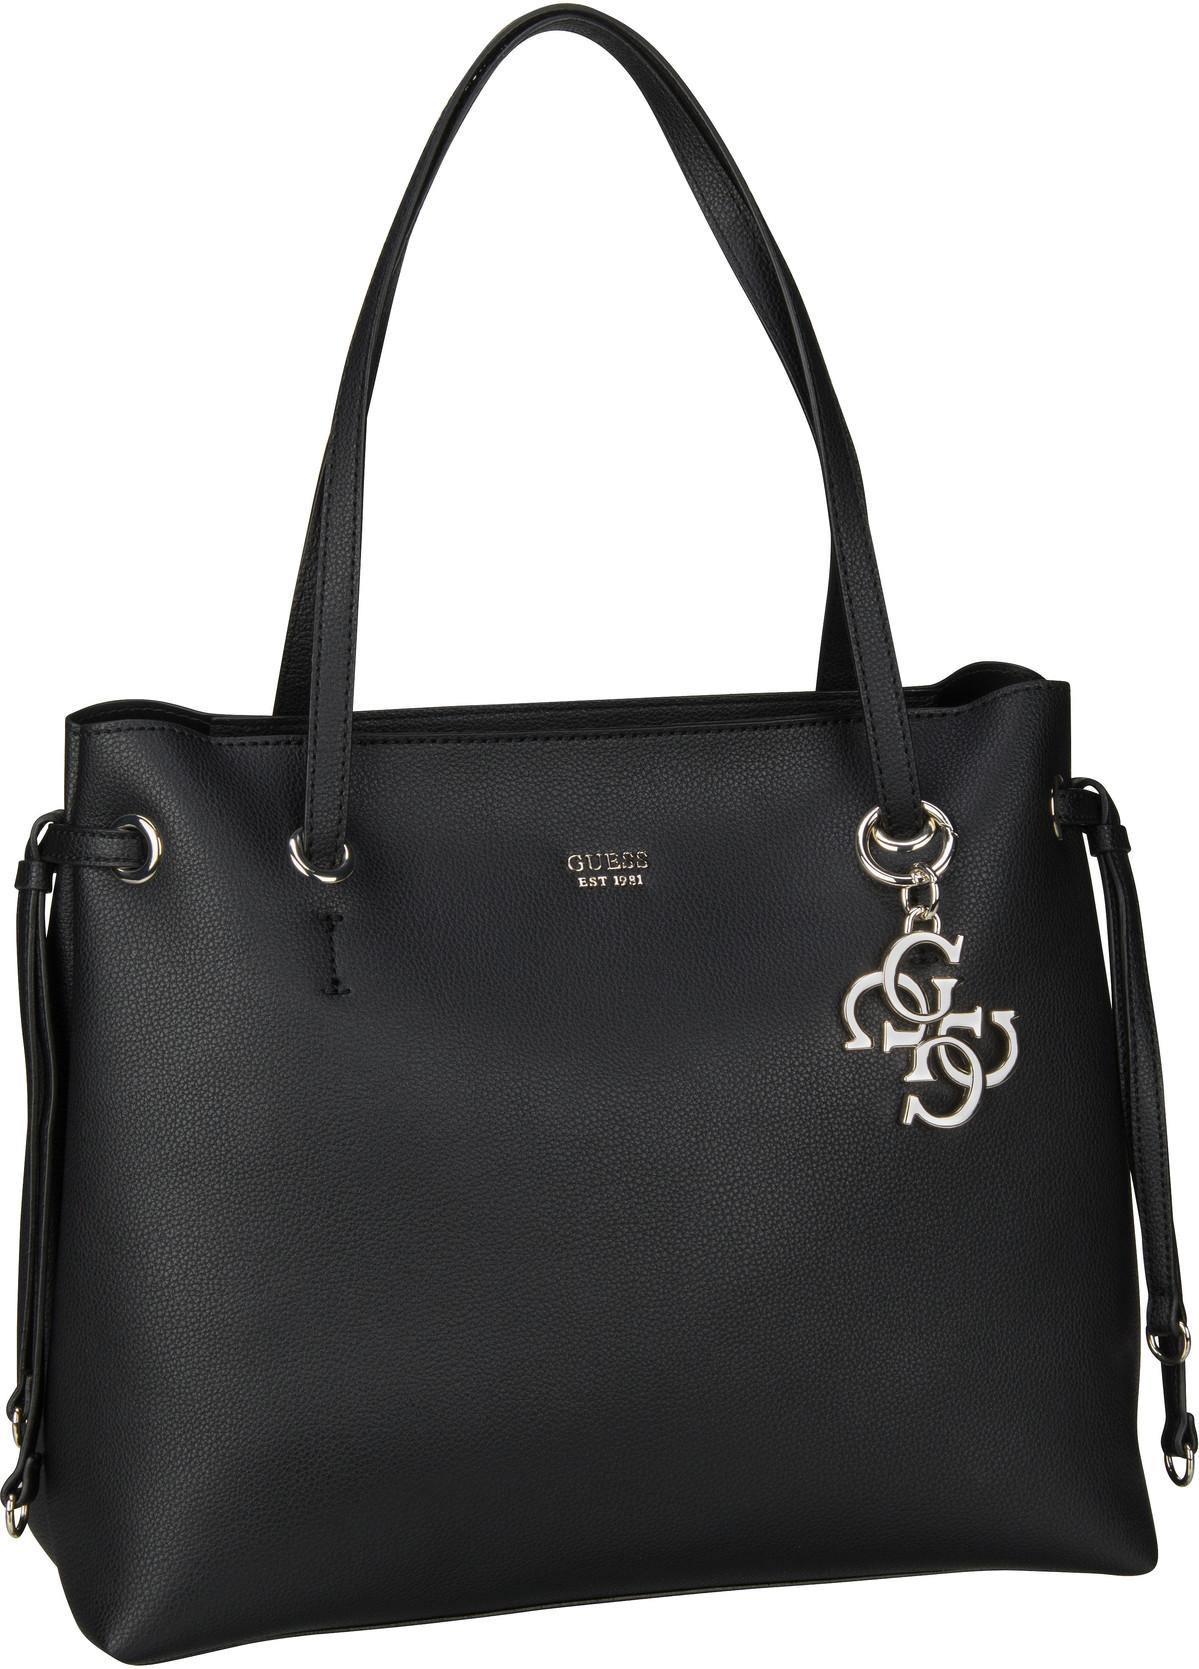 Handtasche Digital Shopper Black